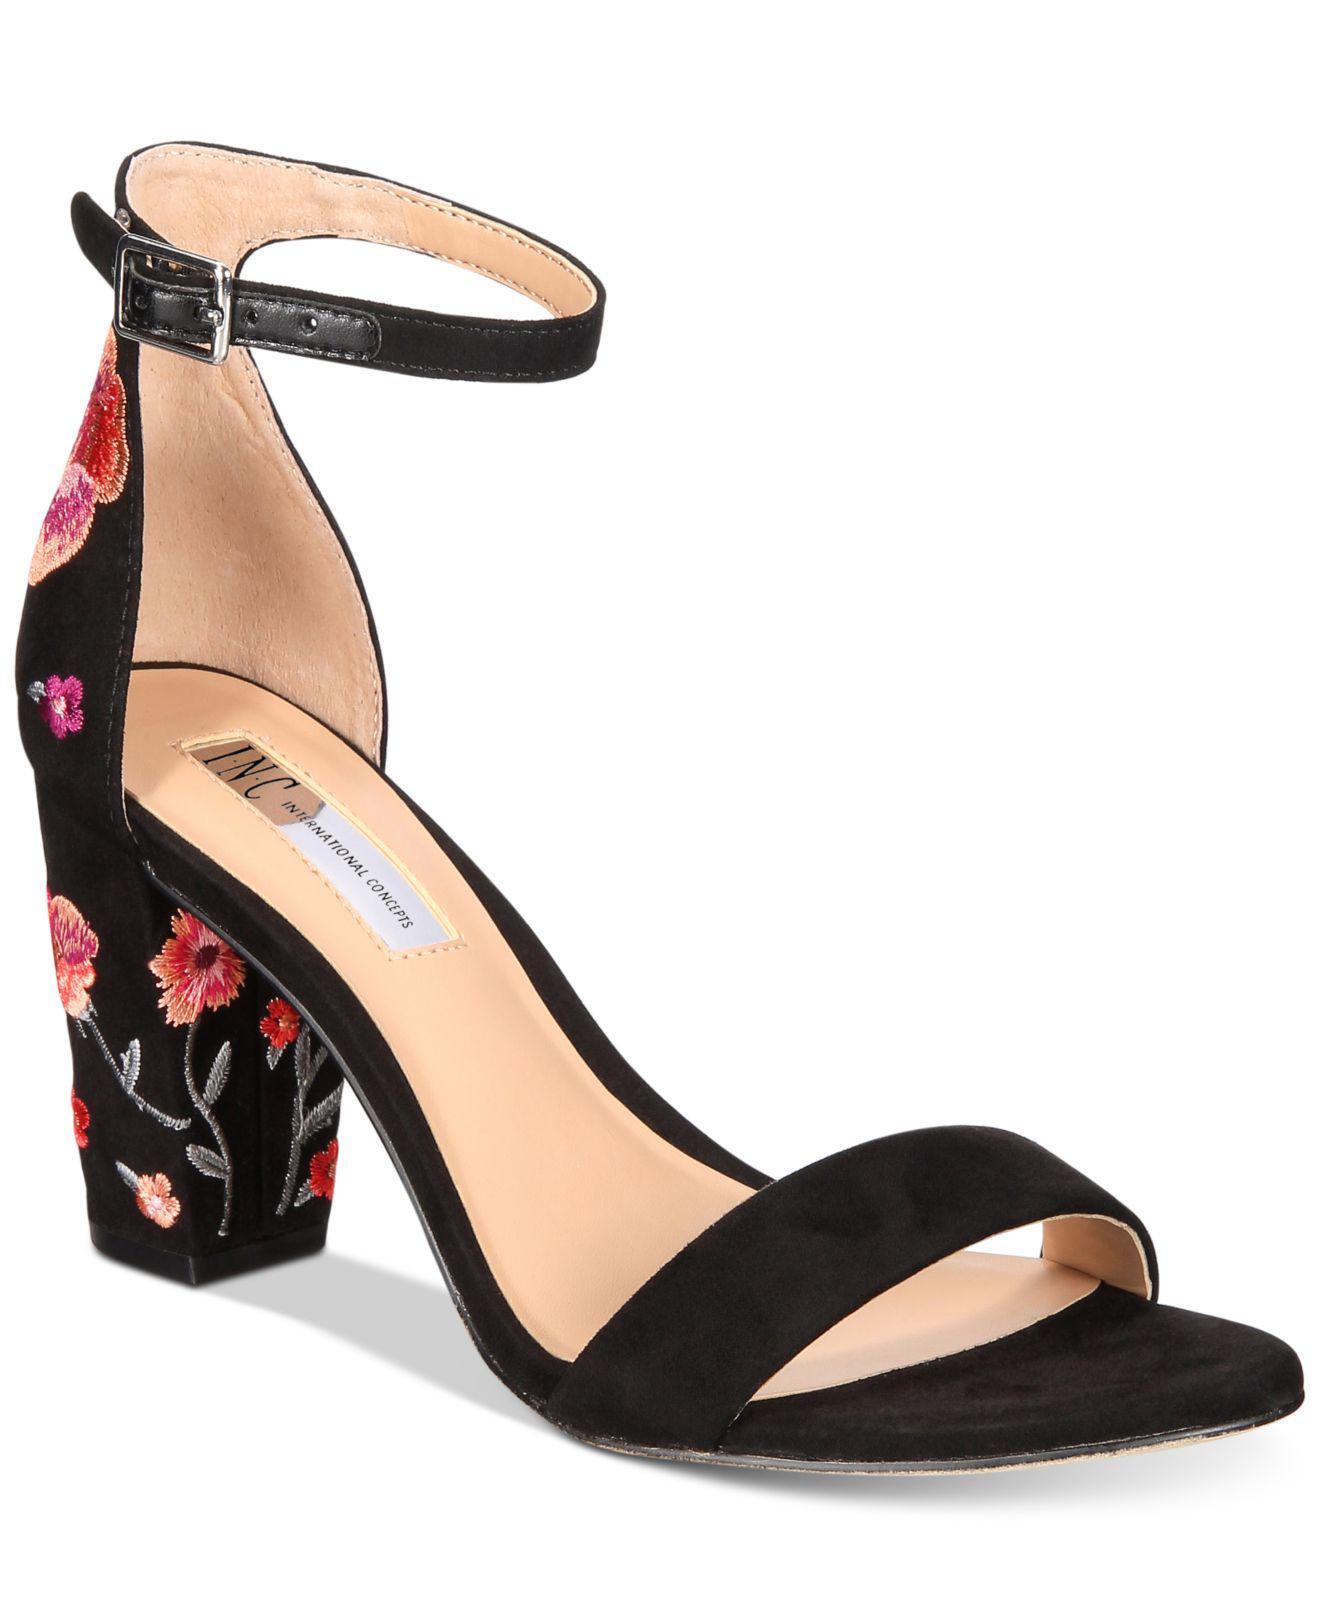 bcd49a99557cb7 Lyst - INC International Concepts Kivah Block-heel Dress Sandals in ...